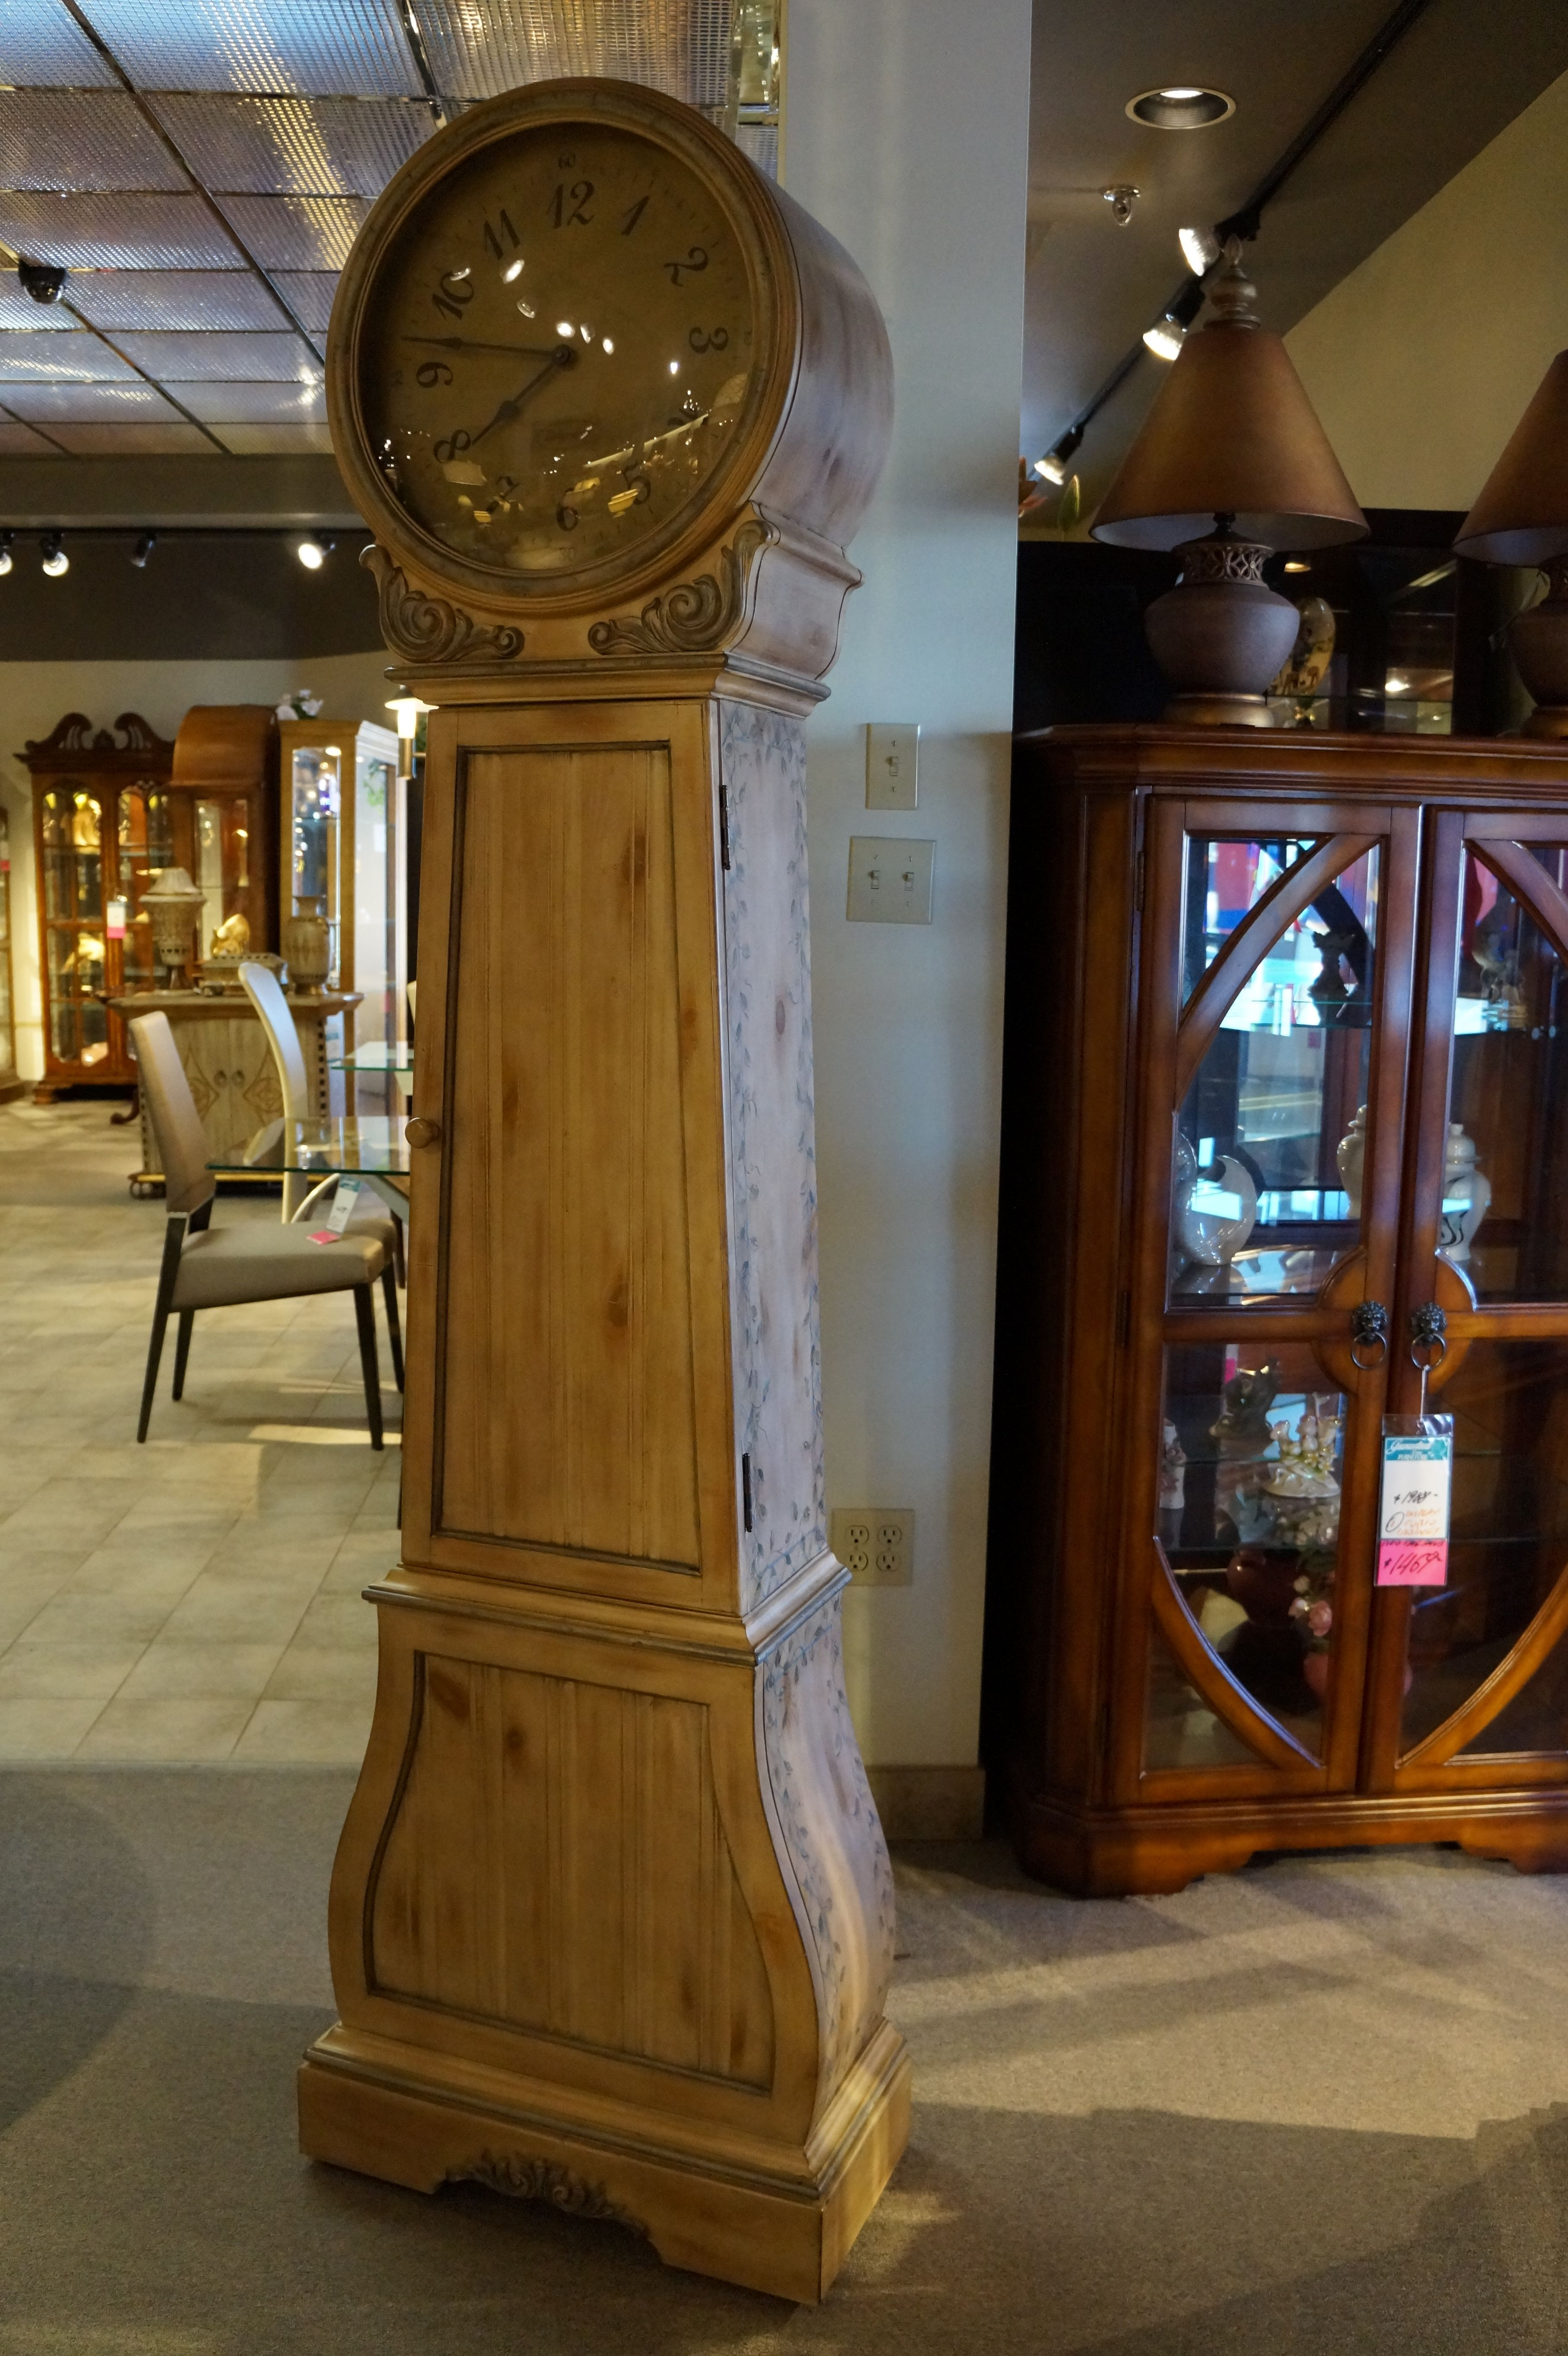 Attirant Antiqued Natural Wood Storage Floor Clock With Subtle Vine Detailing.